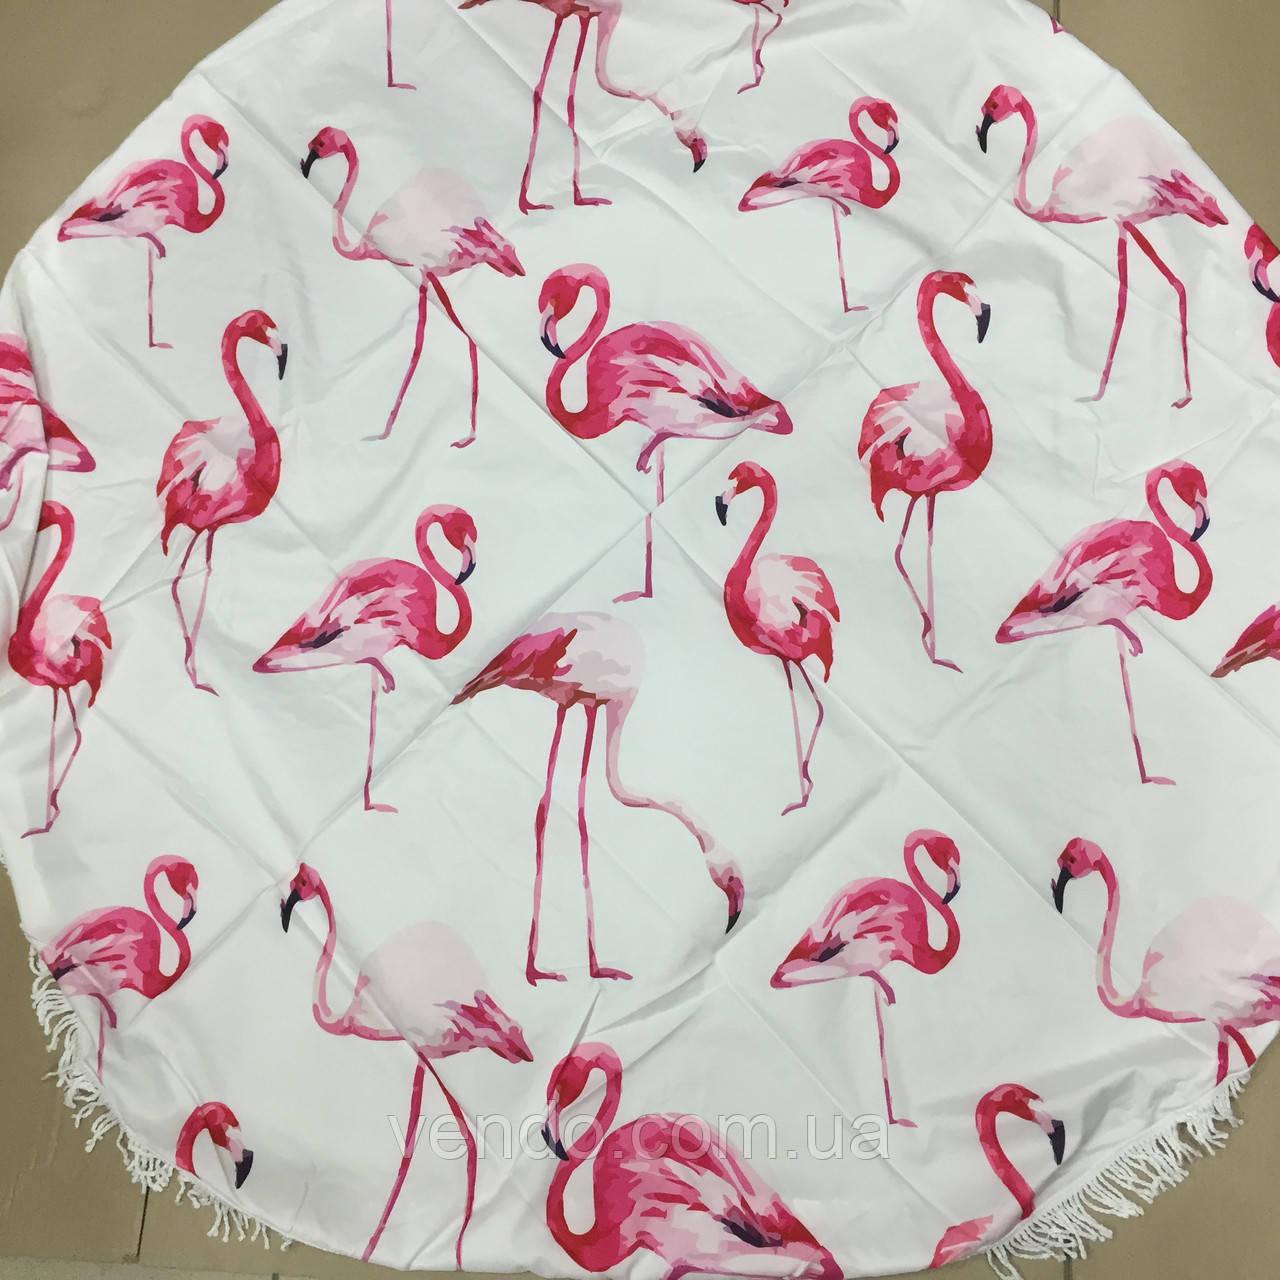 Пляжный коврик Фламинго розовый 150х150 см